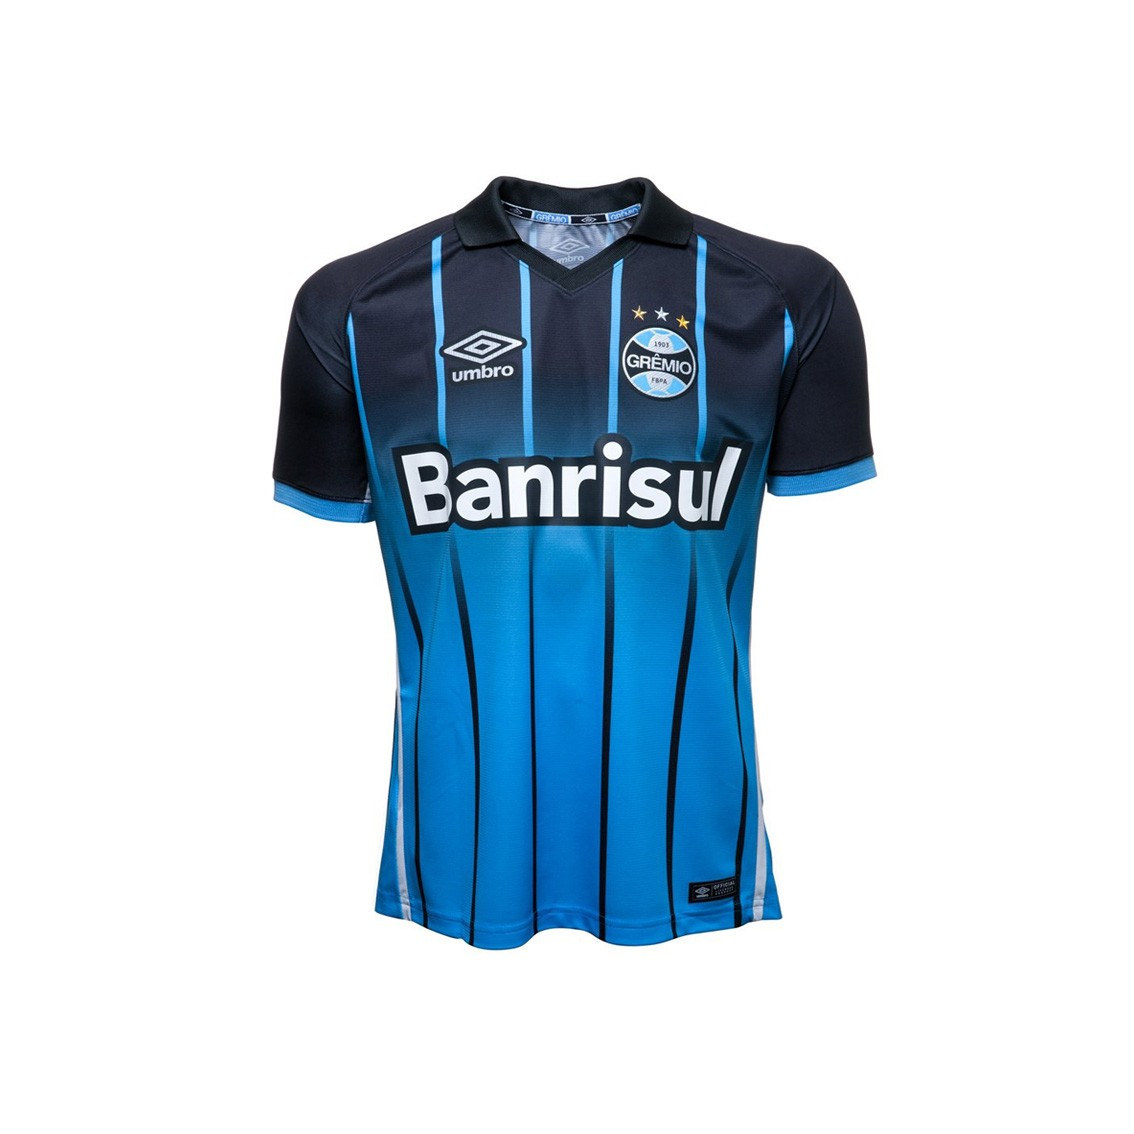 7edfa5d868 Camisa Junior Umbro Grêmio Oficial III 2016 3G00065 Preto Azul Branco